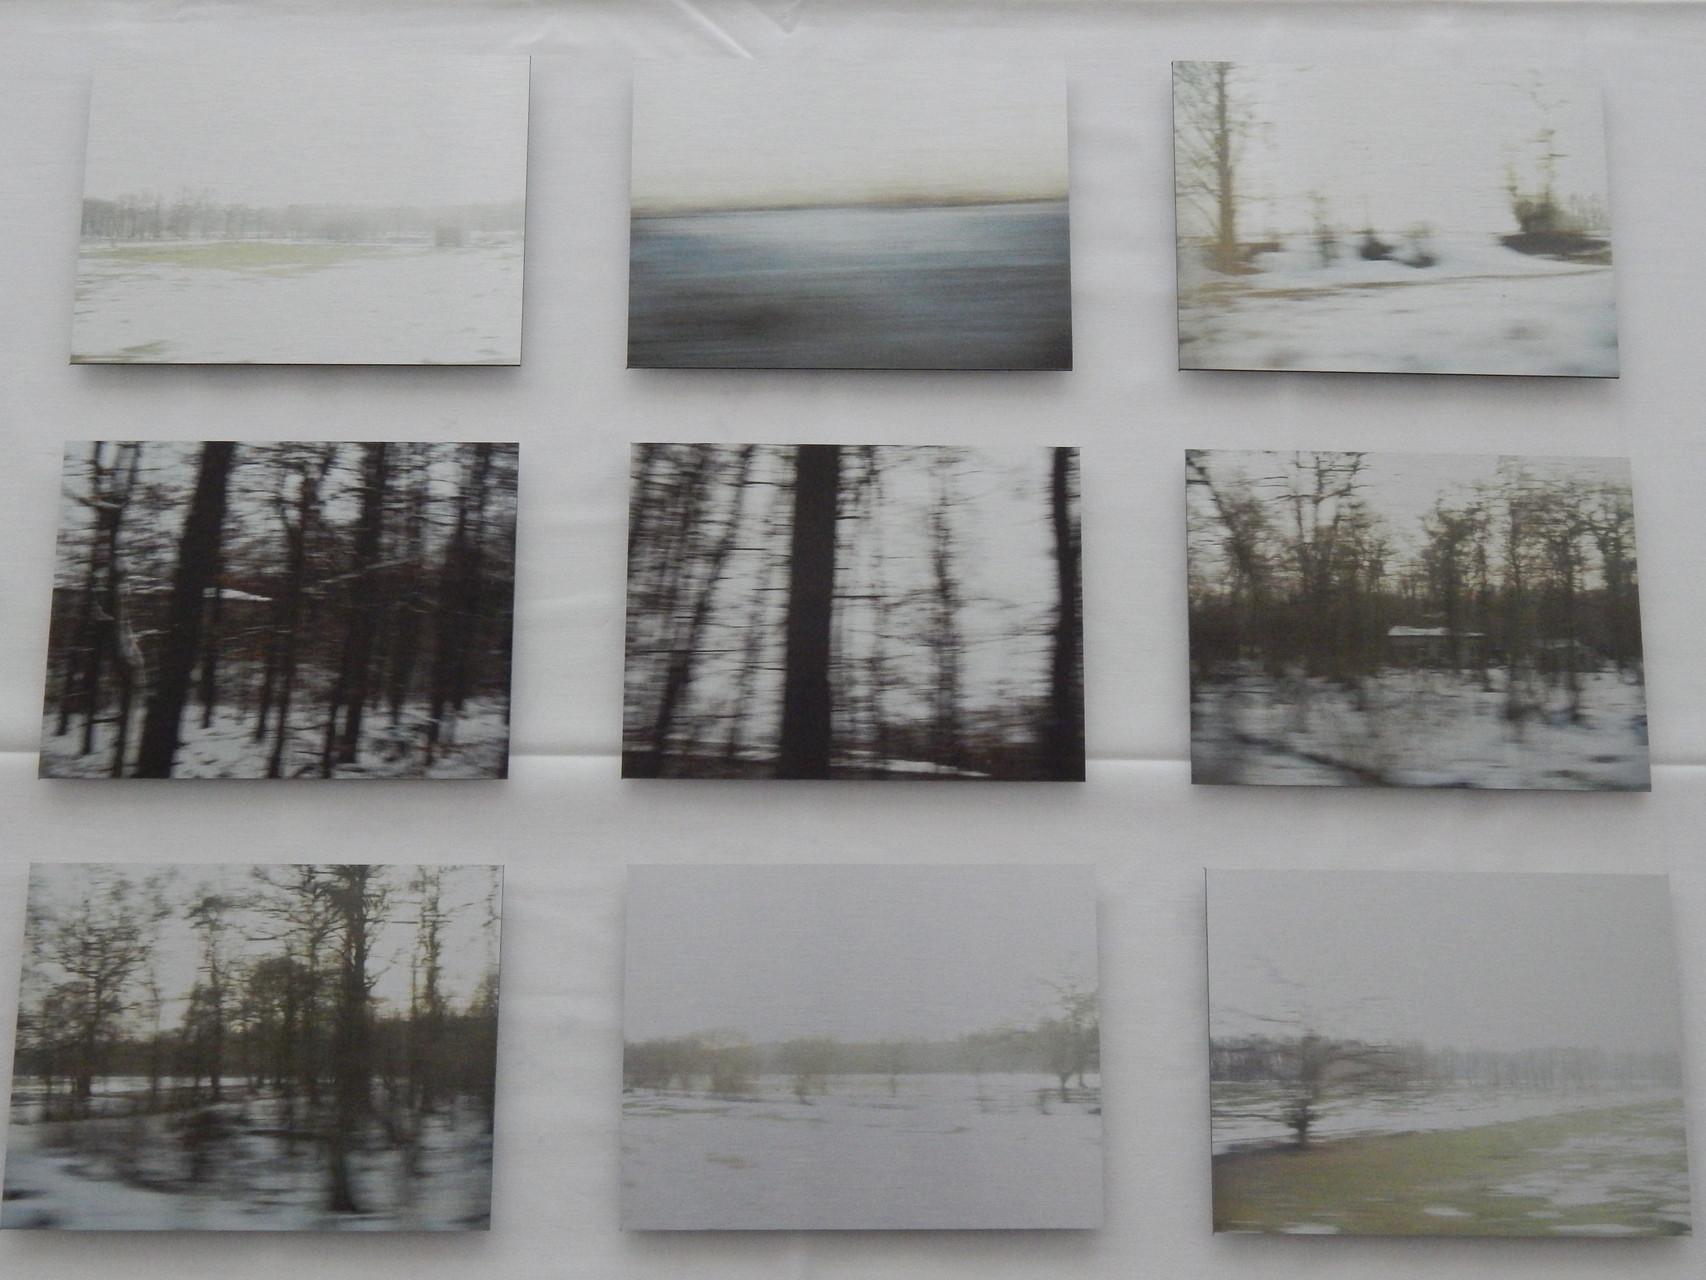 Ich glaub, ich bin im Wald 2015 neun Teile 15x20cm Print auf Aluminium